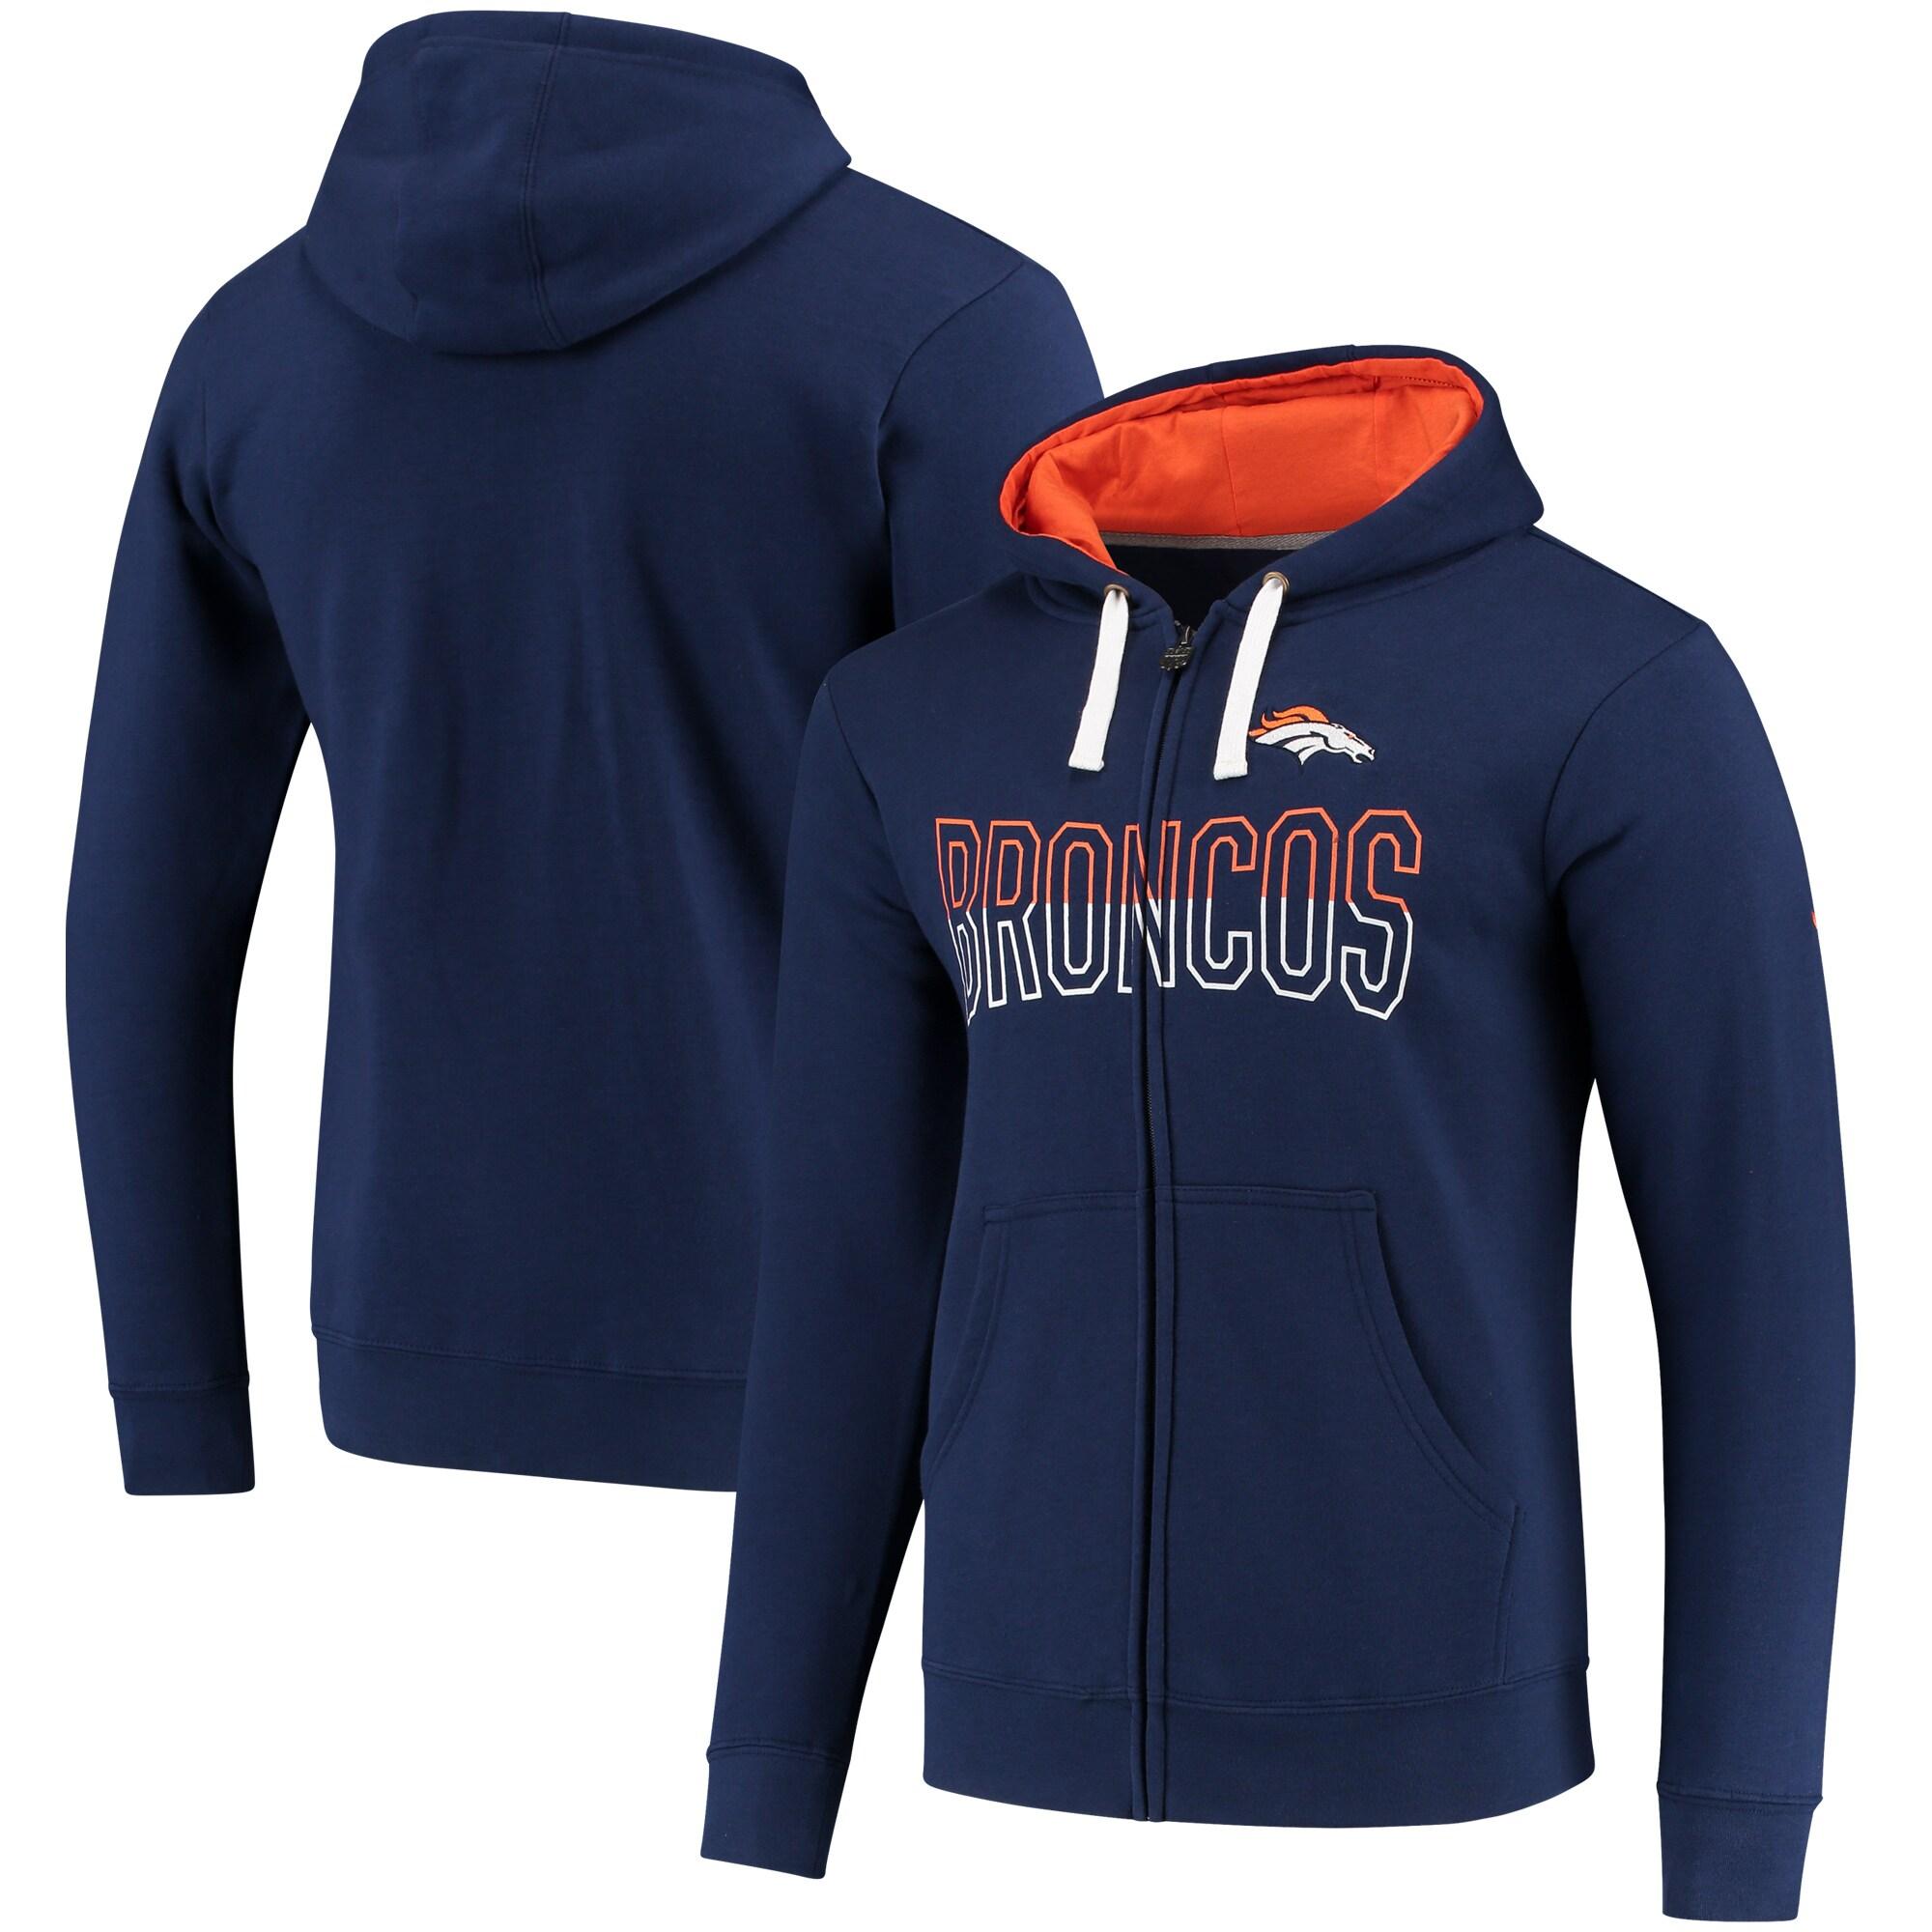 Denver Broncos NFL Pro Line by Fanatics Branded Iconic Fleece Full-Zip Hoodie - Navy